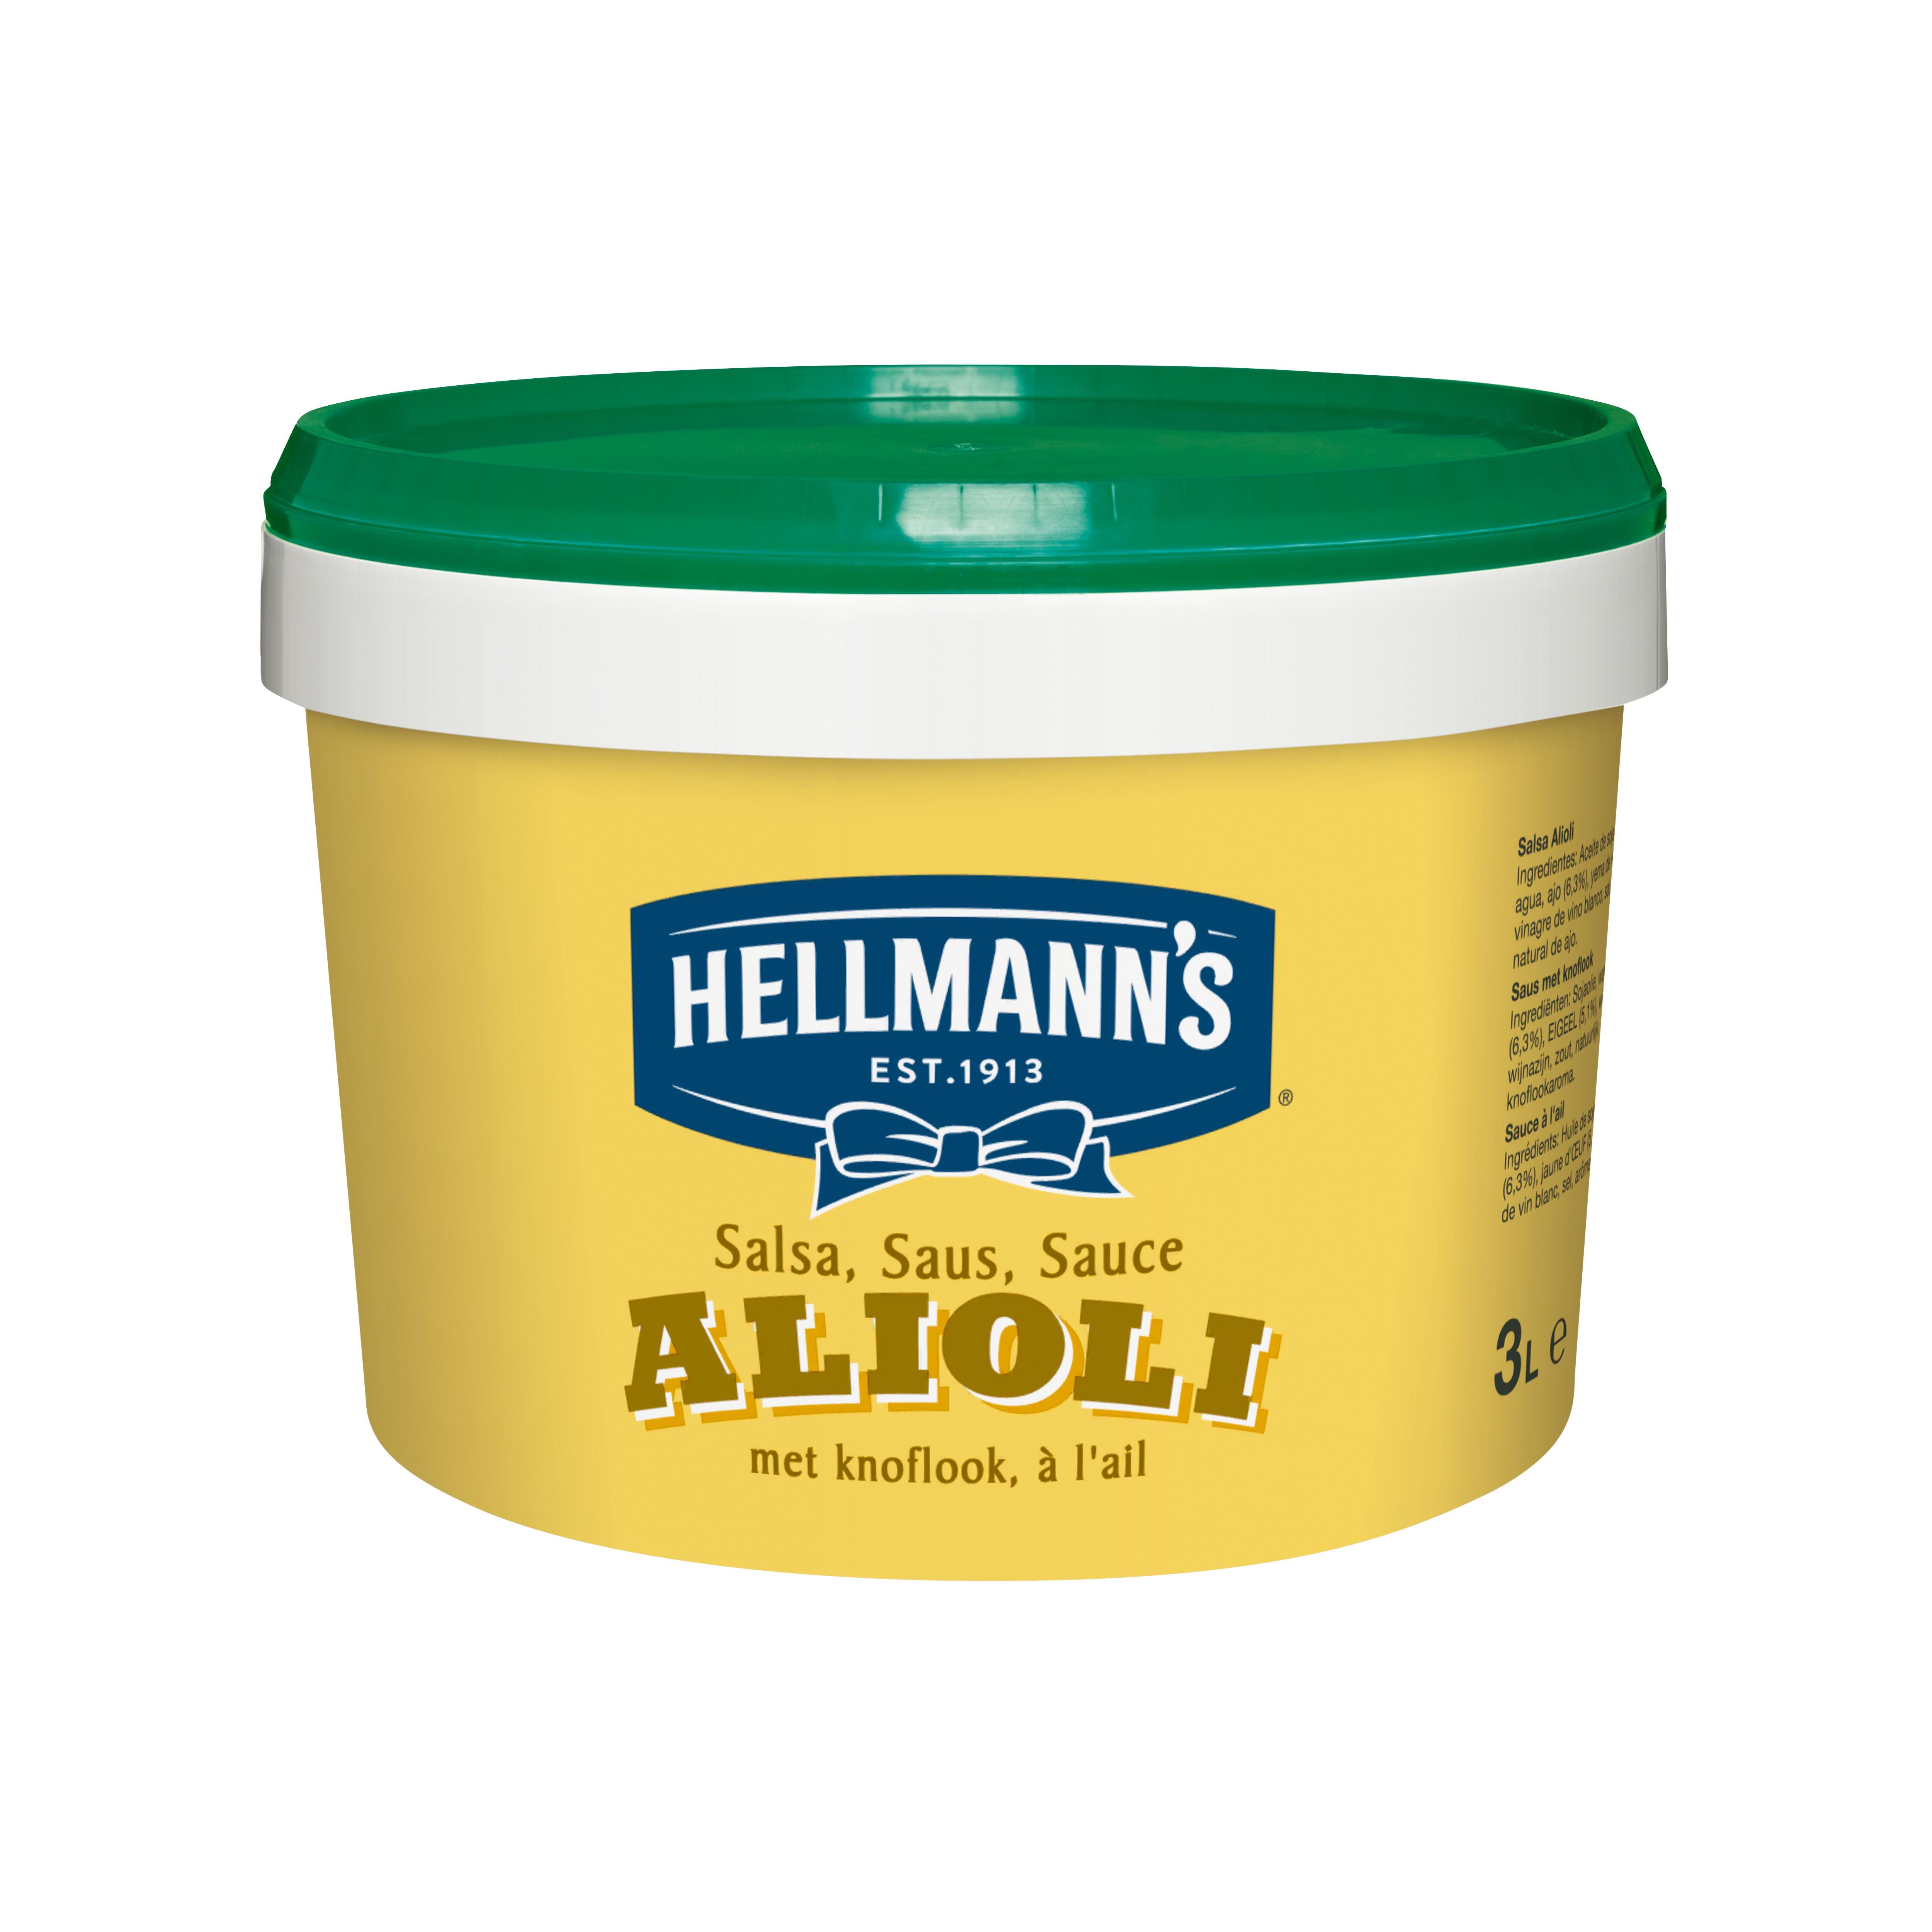 Hellmann's Alioli saus